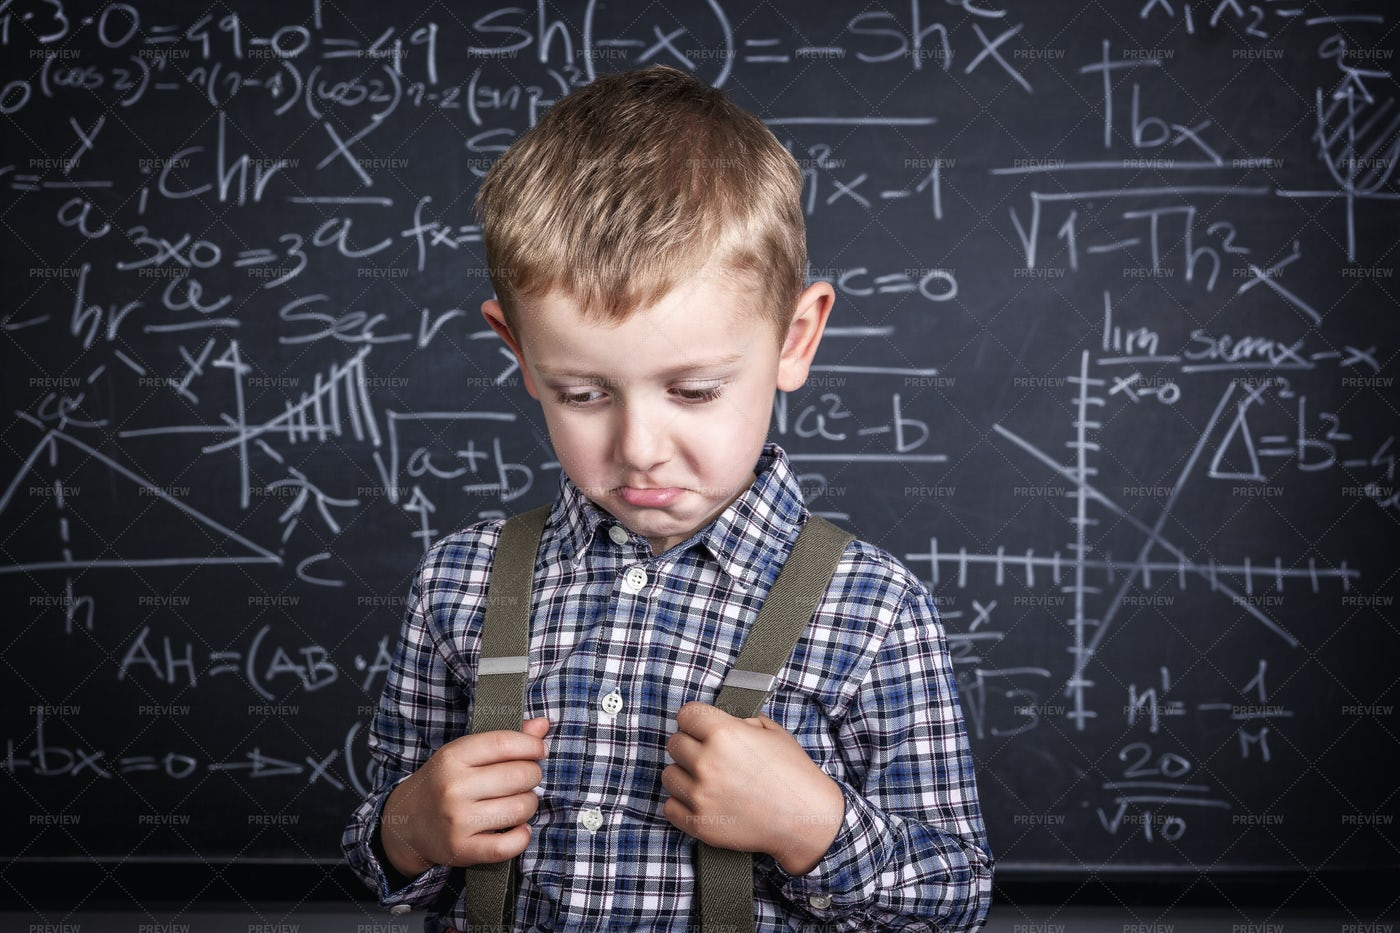 Frustrated School Boy And Blackboard: Stock Photos